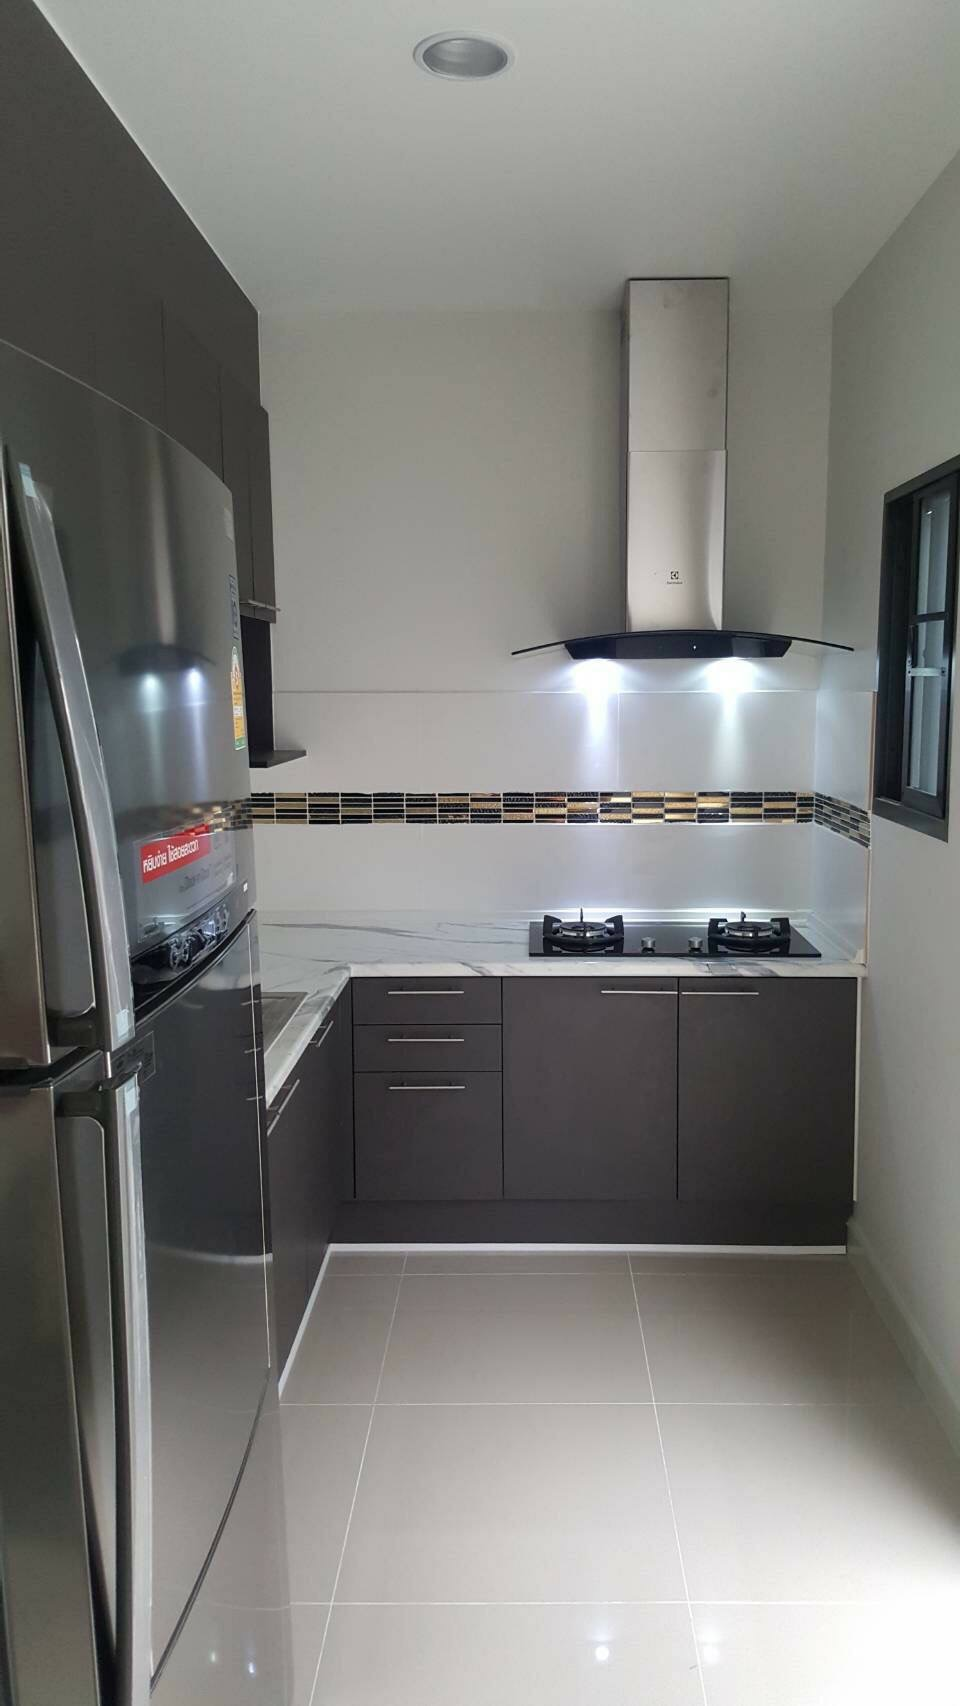 Dark Brown Modern Kitchen (ครัวบิ้วอินสีน้ำตาลเข้มสไตล์โมเดิร์น)